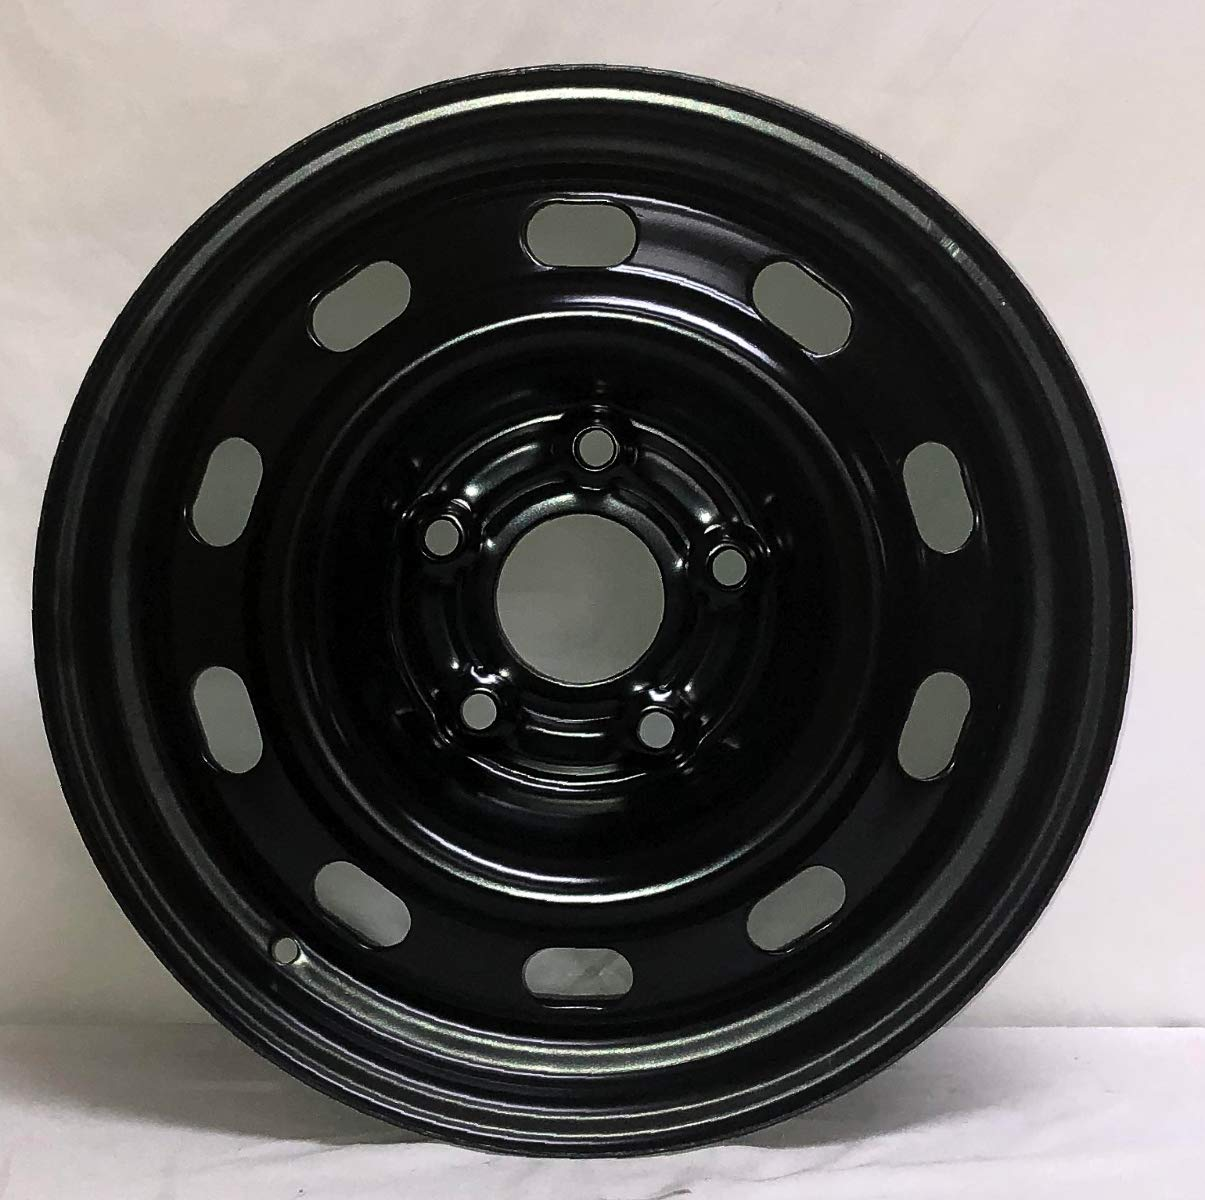 Dodge Ram 1500 Tires >> New 17 Dodge Ram 1500 Steel Wheels Rims 5x5 5 We5122n